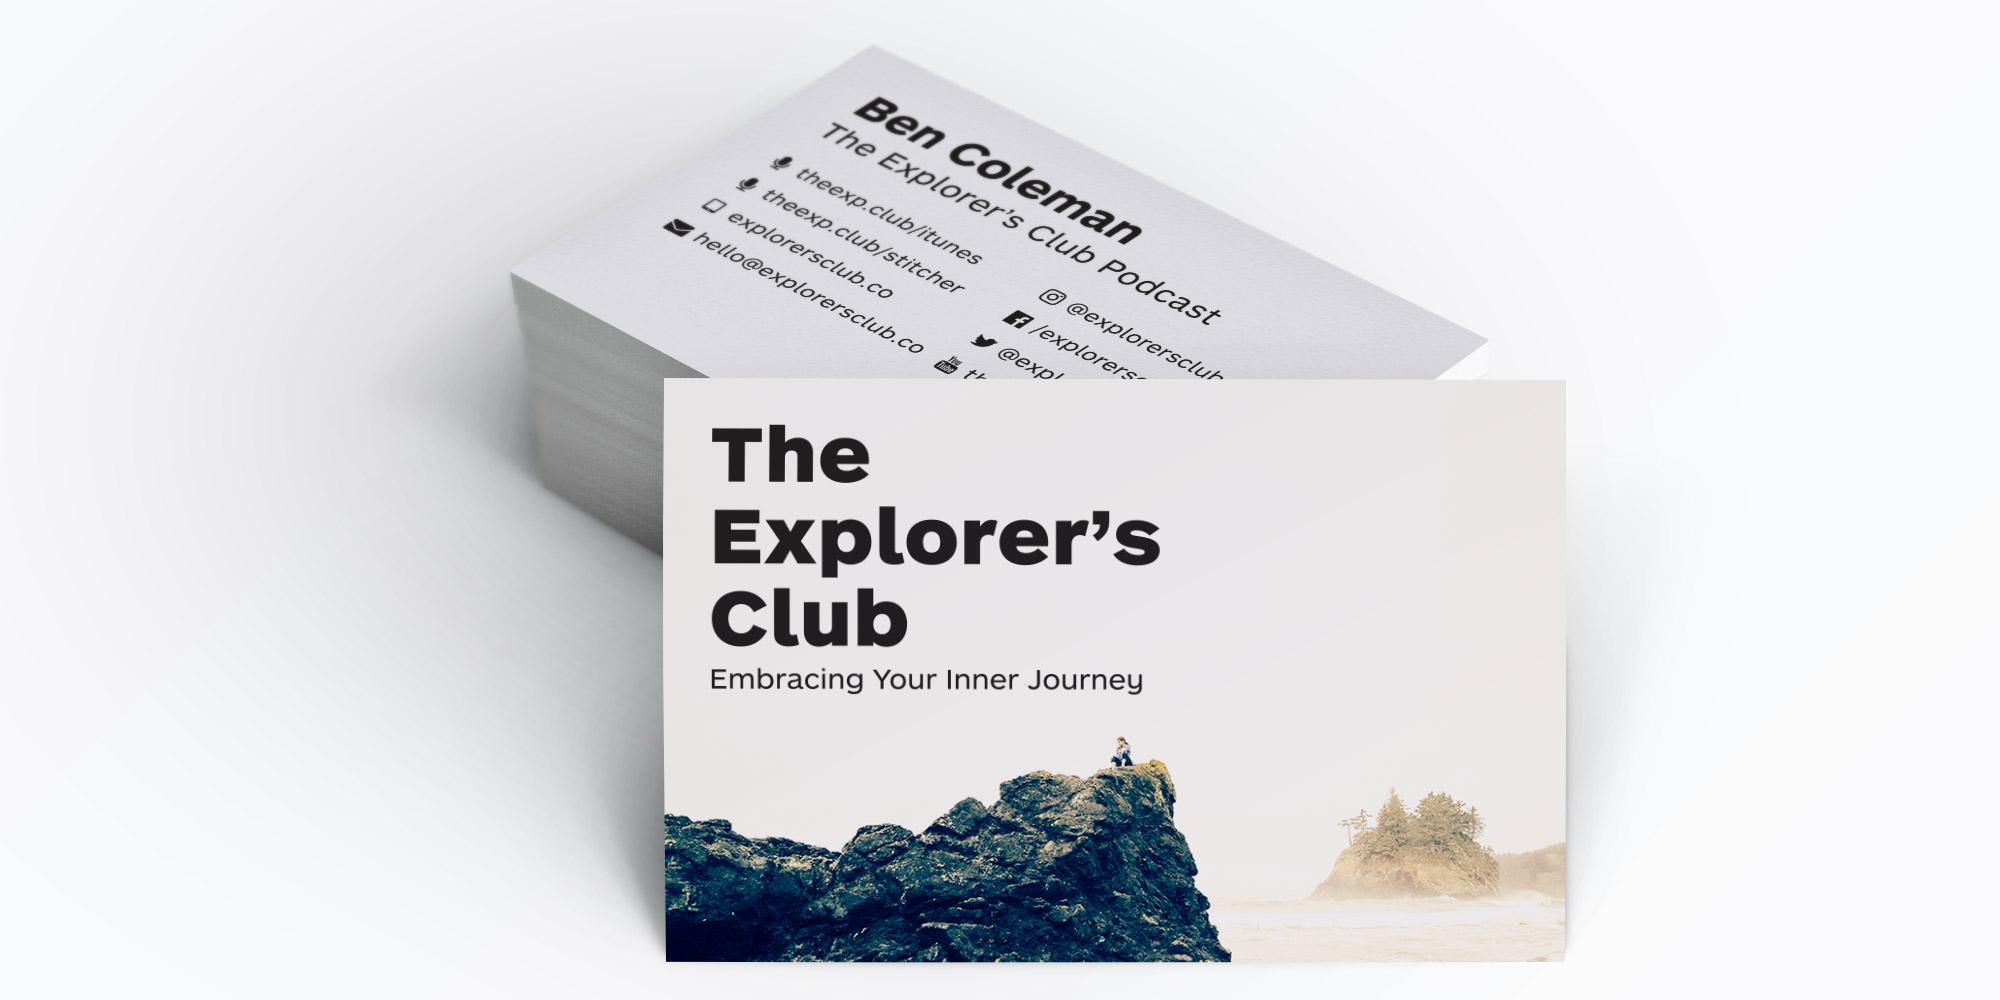 explorersclub_05_2x1@2x.jpg